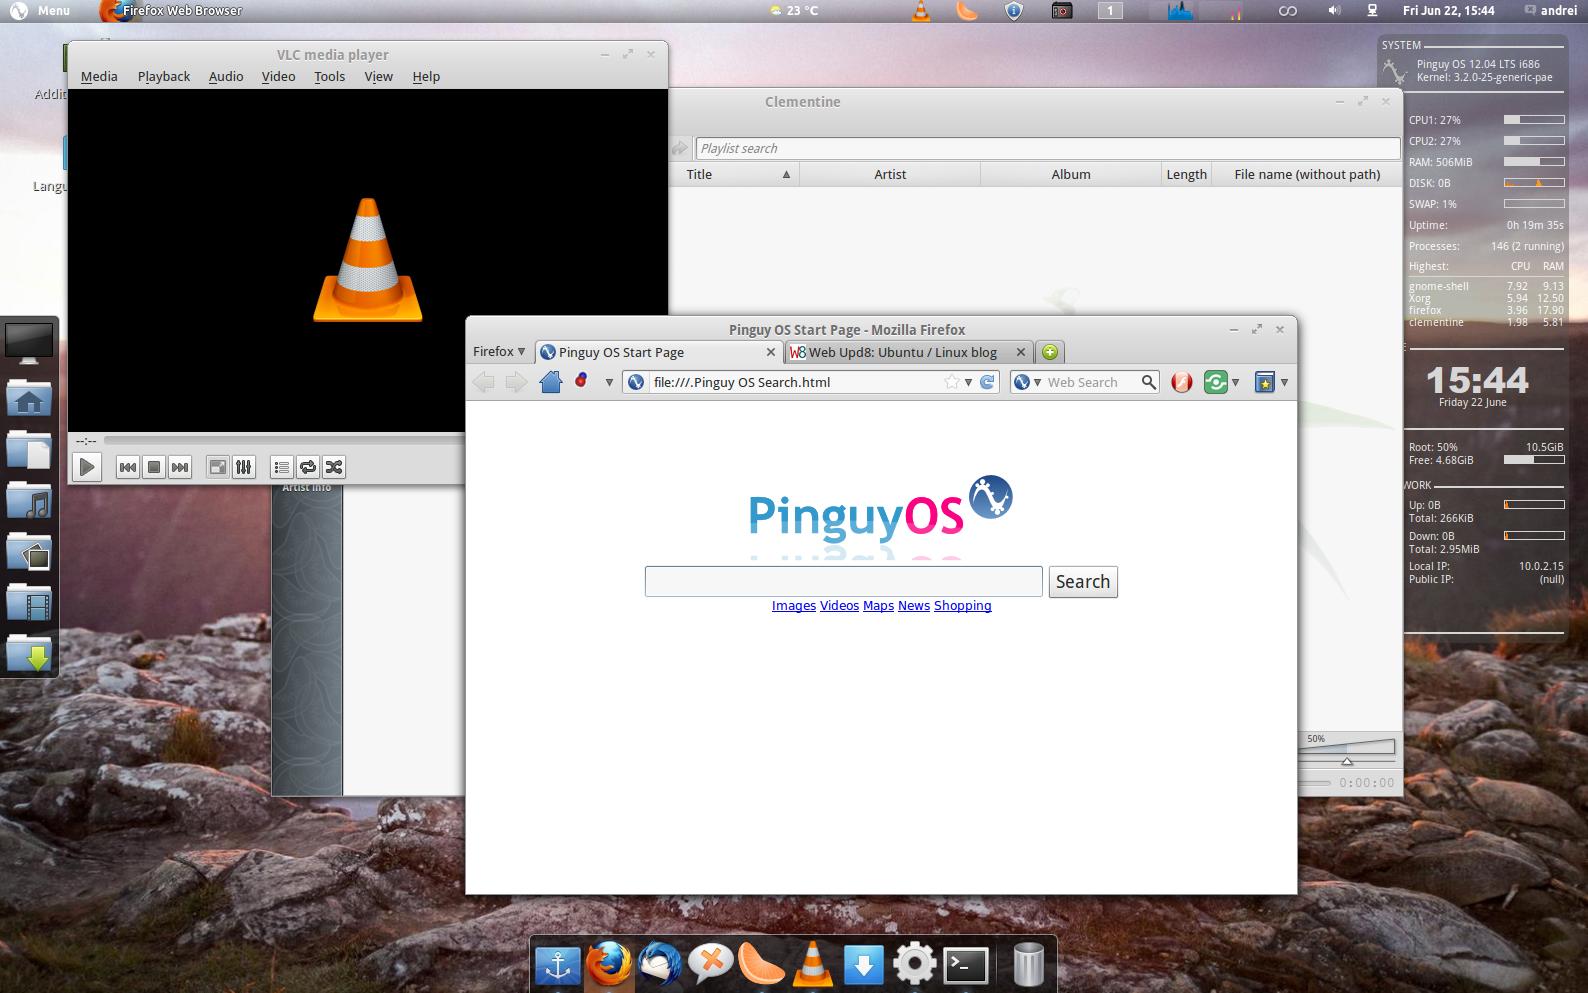 http://4.bp.blogspot.com/-HtDcAiuwM30/T-Ro9cqMweI/AAAAAAAAJLU/Wztzev9HiBU/s1600/pinguy-os-12.04-apps.png